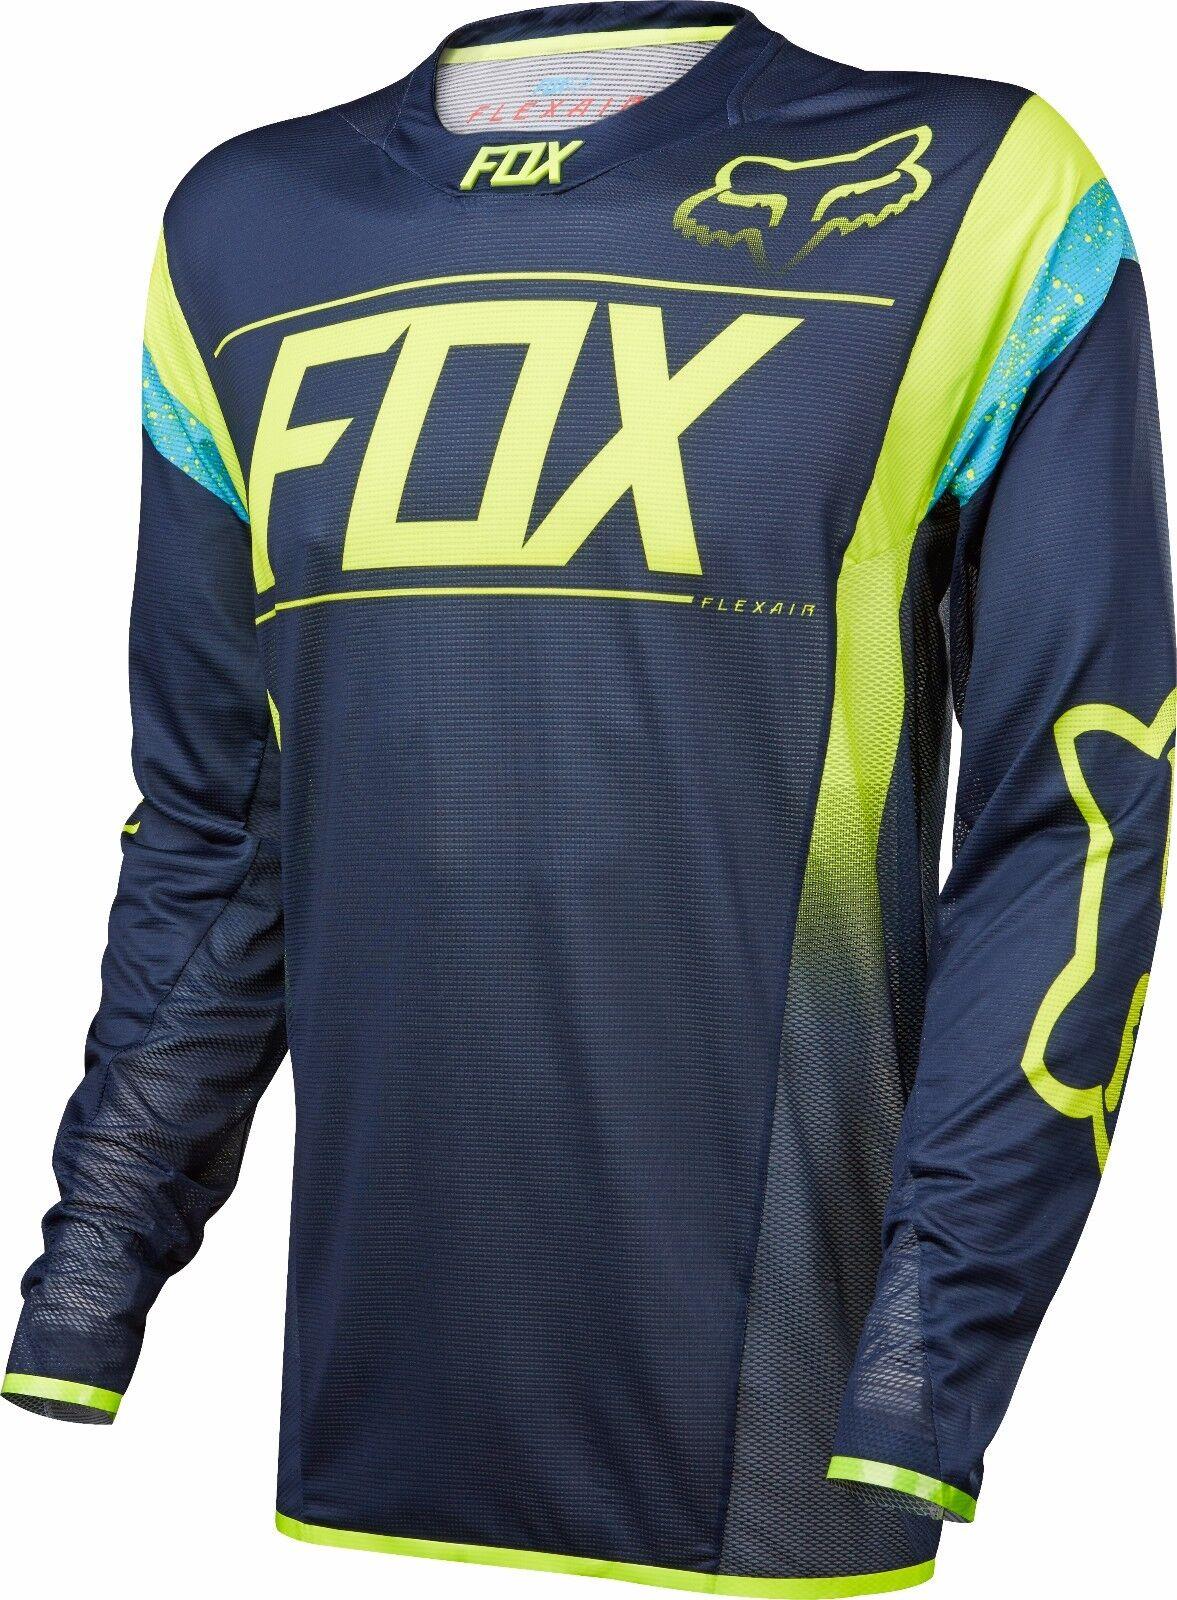 Fox Racing flexair DH manga L   s camiseta azul marino